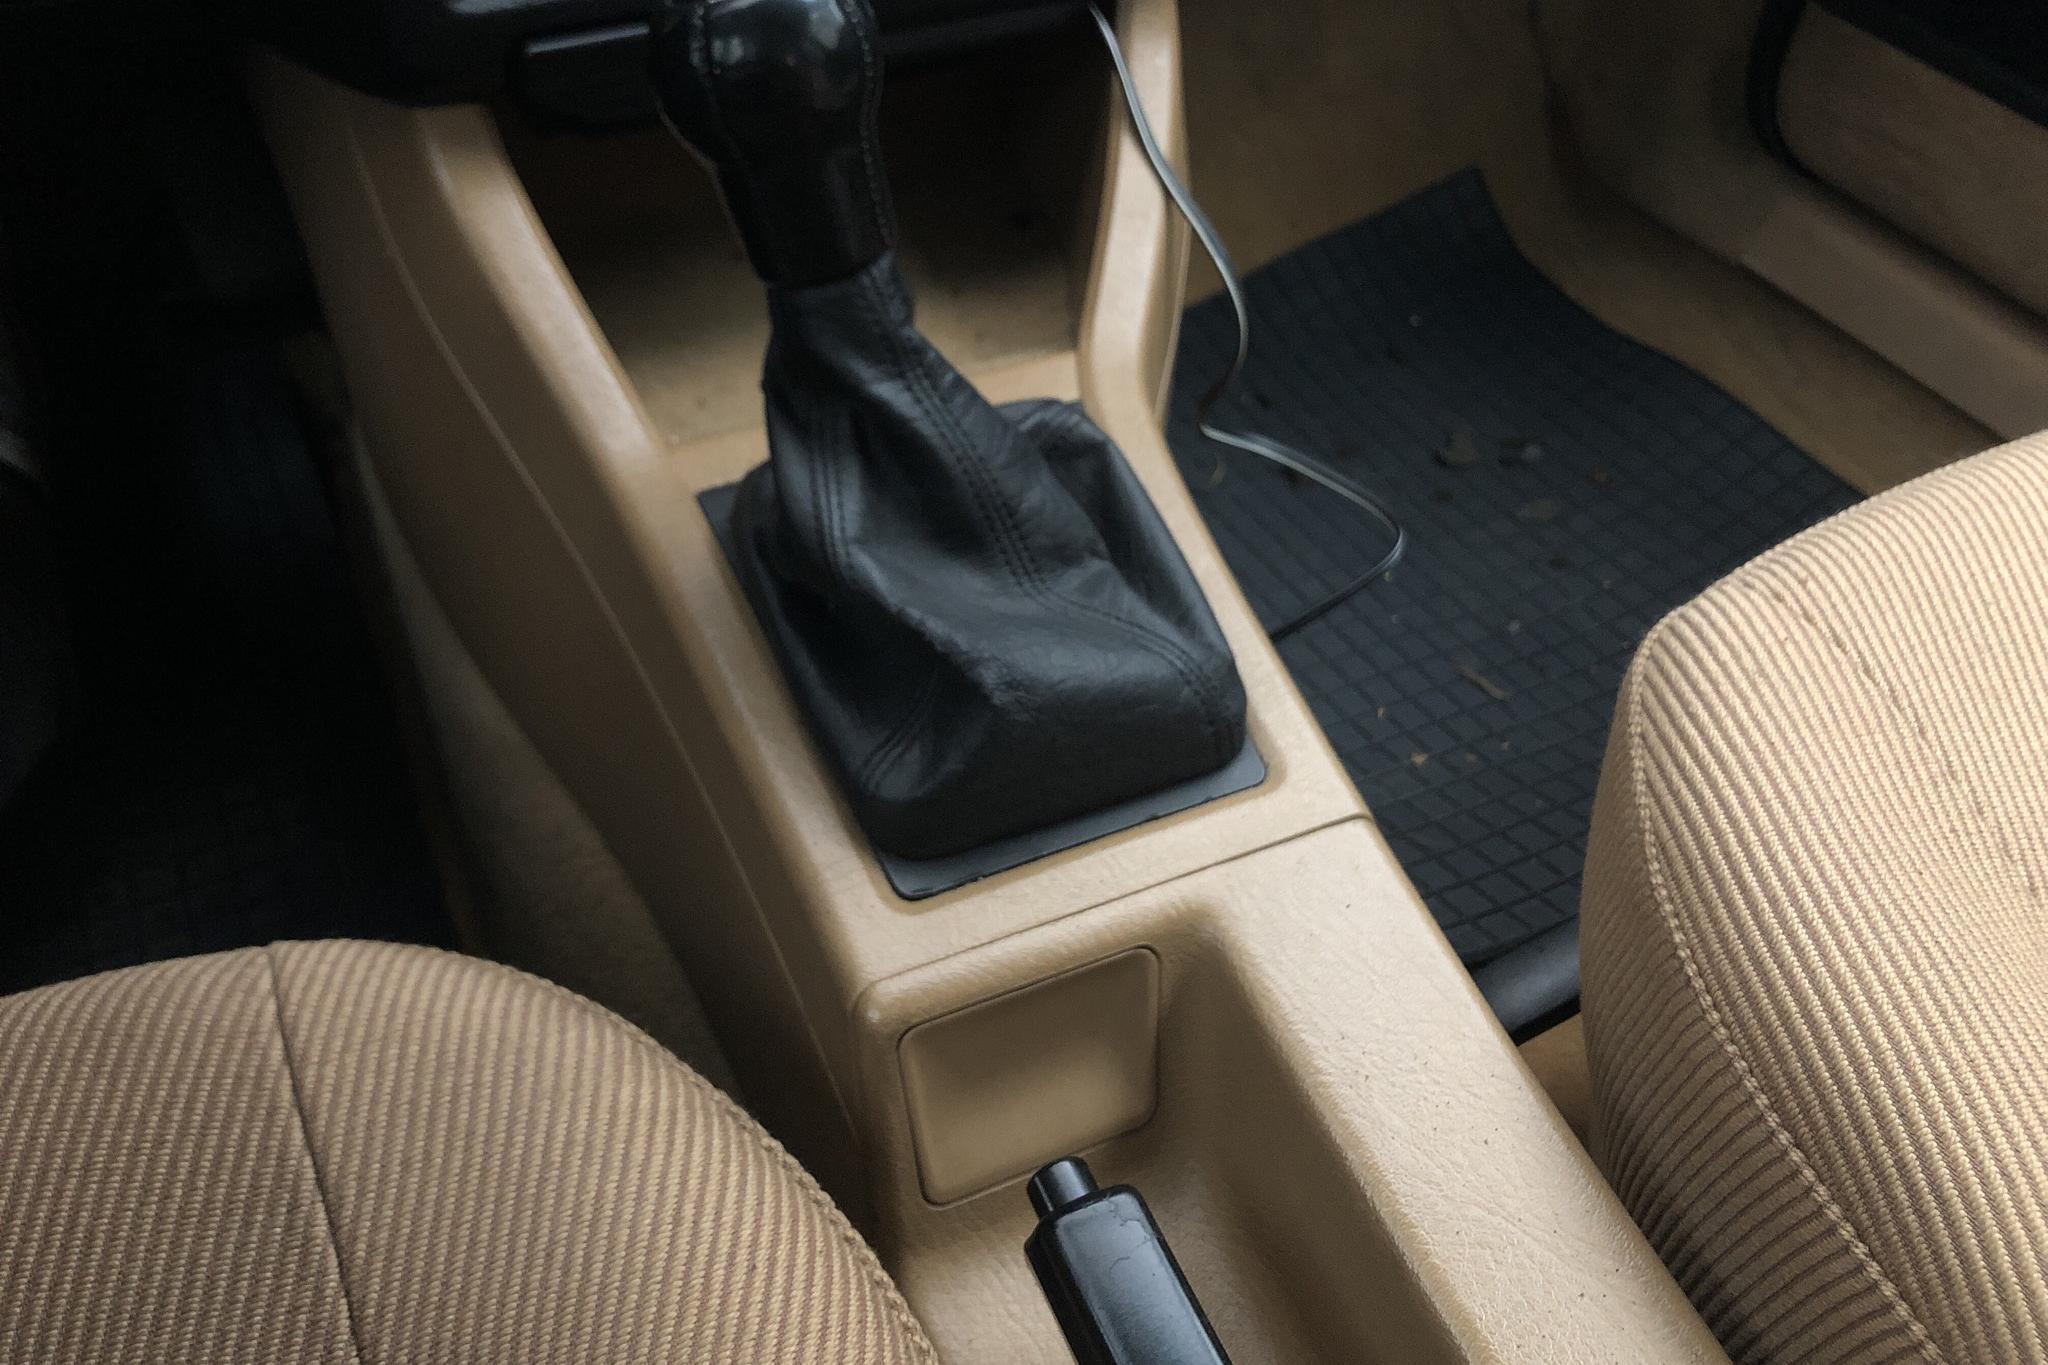 Audi 80 1,8 (90hk) - 21 589 mil - Manuell - Light Brown - 1988